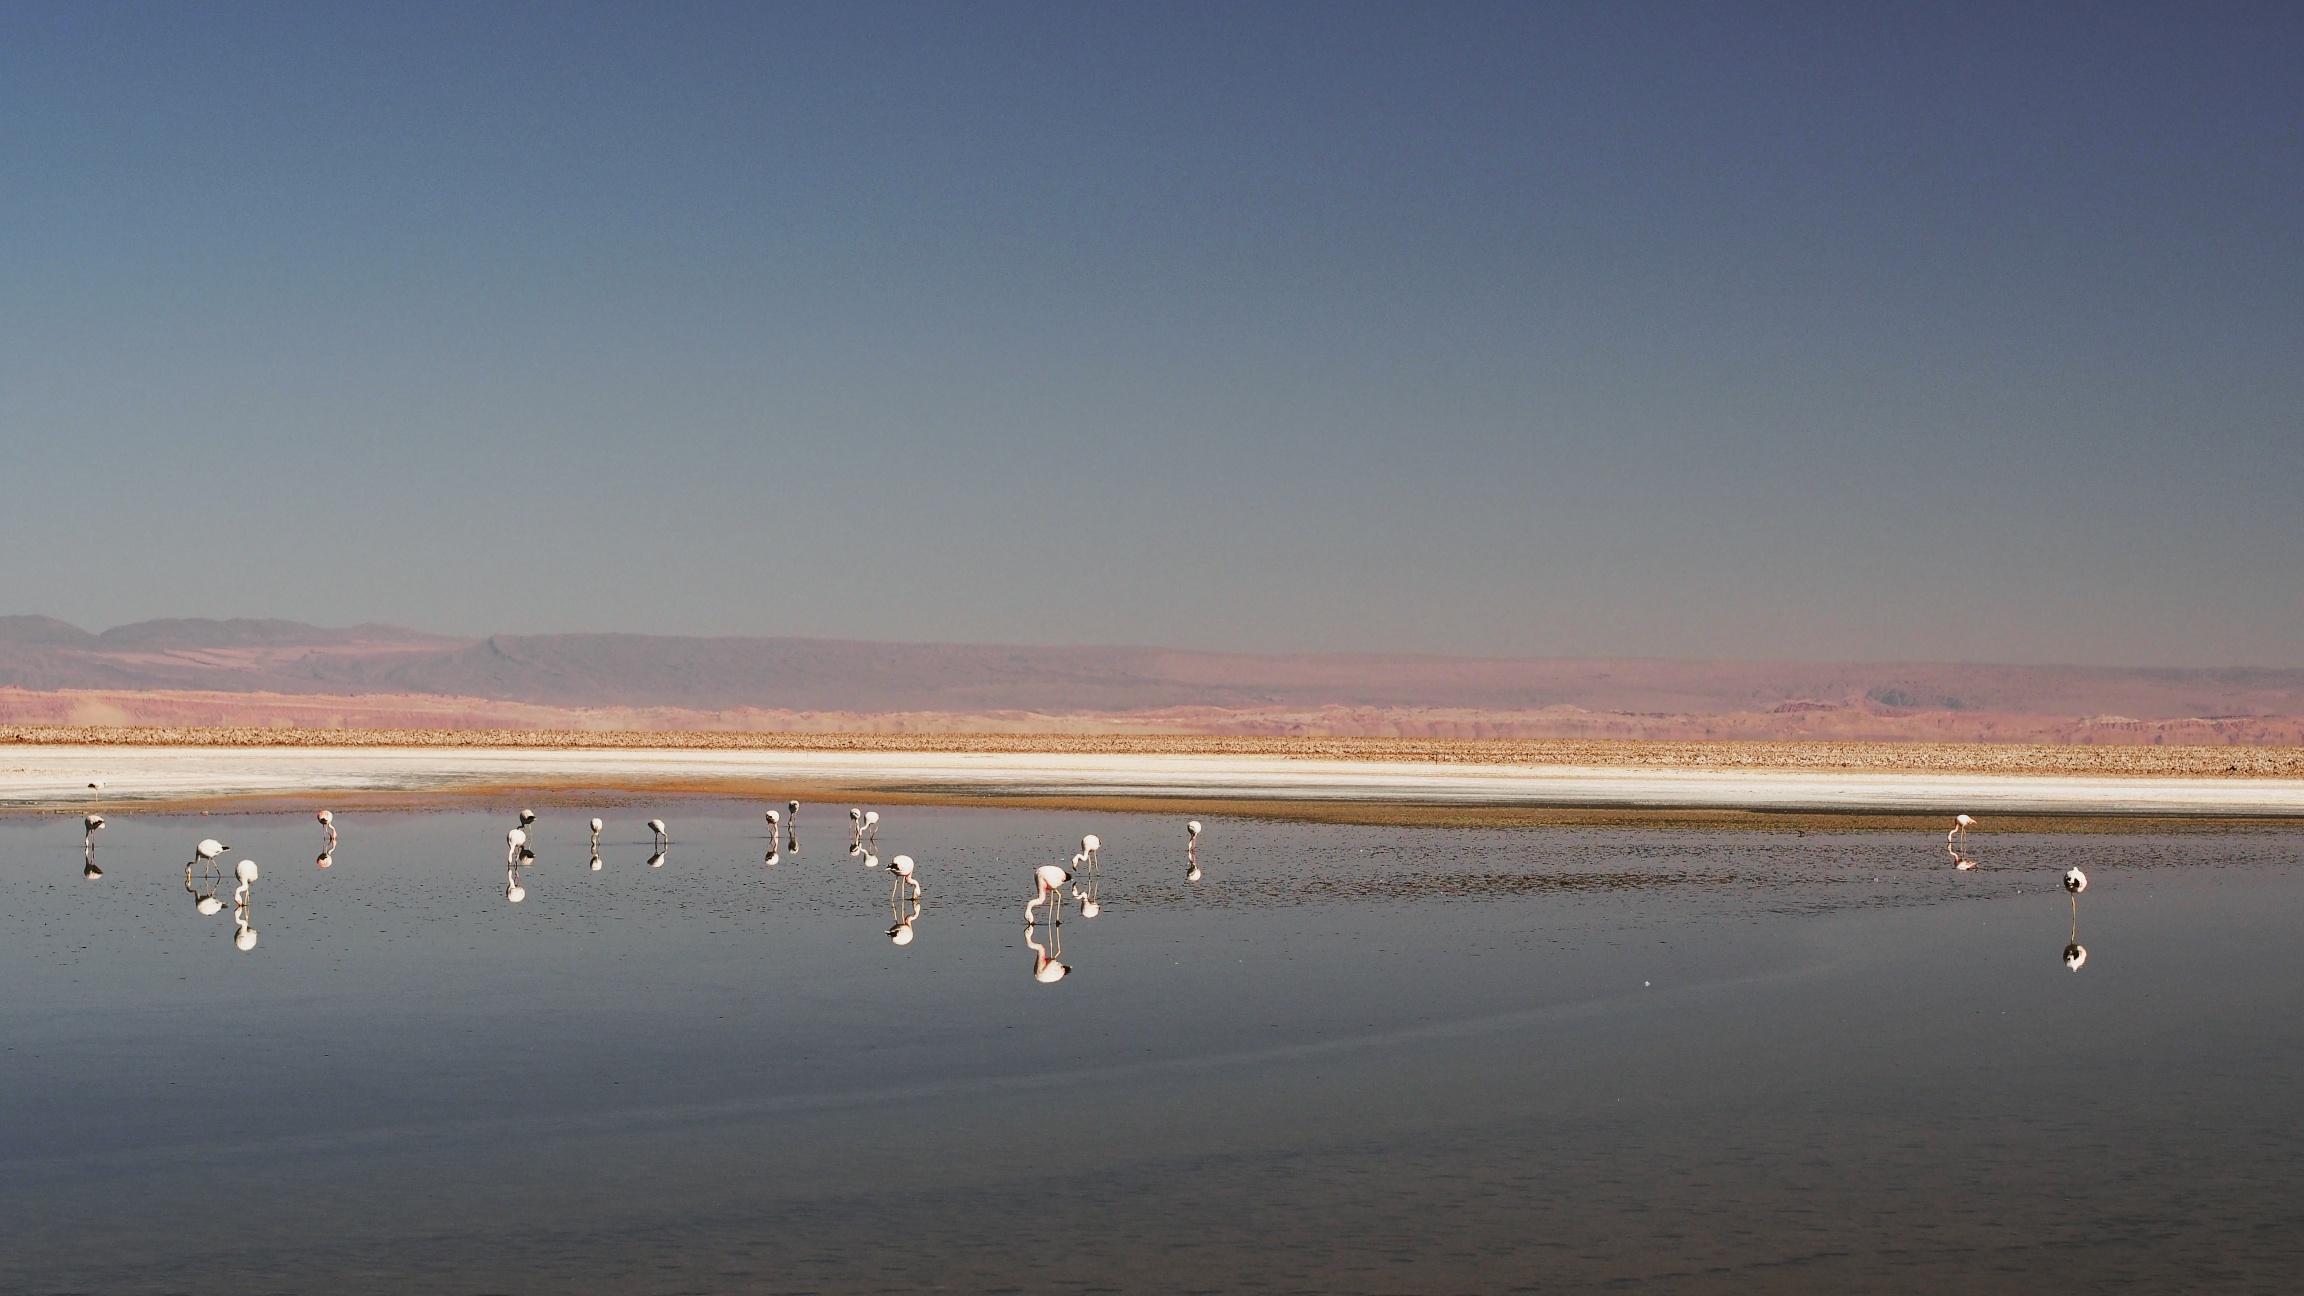 Flamingos on Salar de Atacama